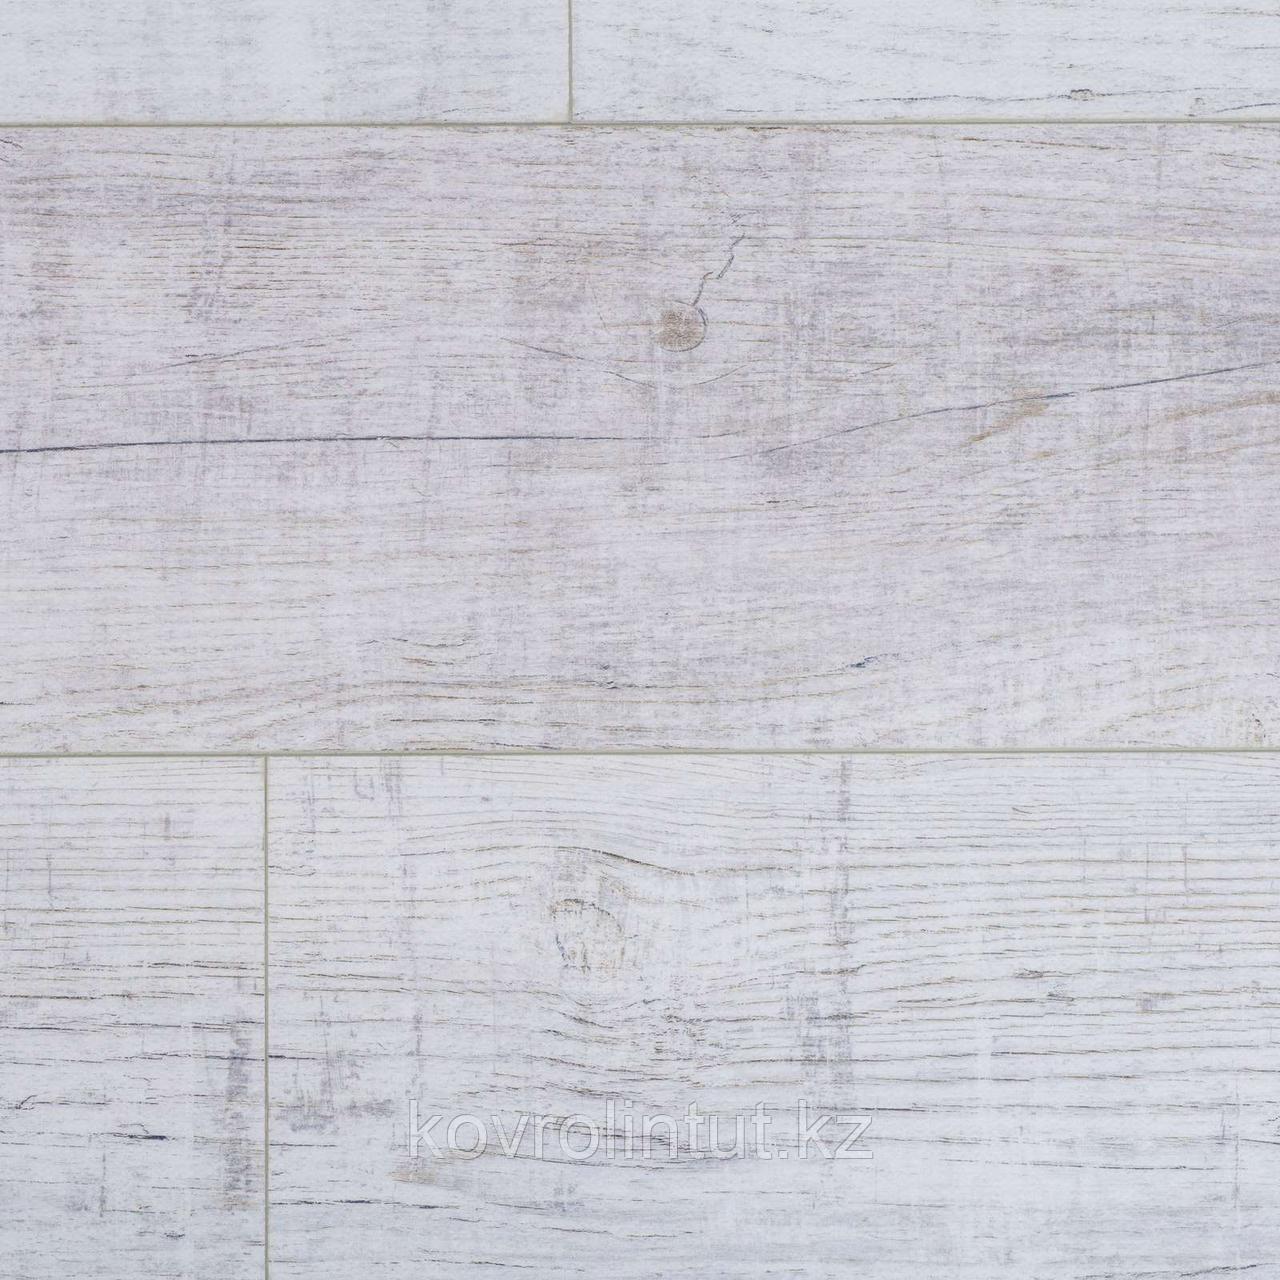 Плитка замковая Ceramin Neo 2.0 Wood Crafted Wood 40712 (N503)